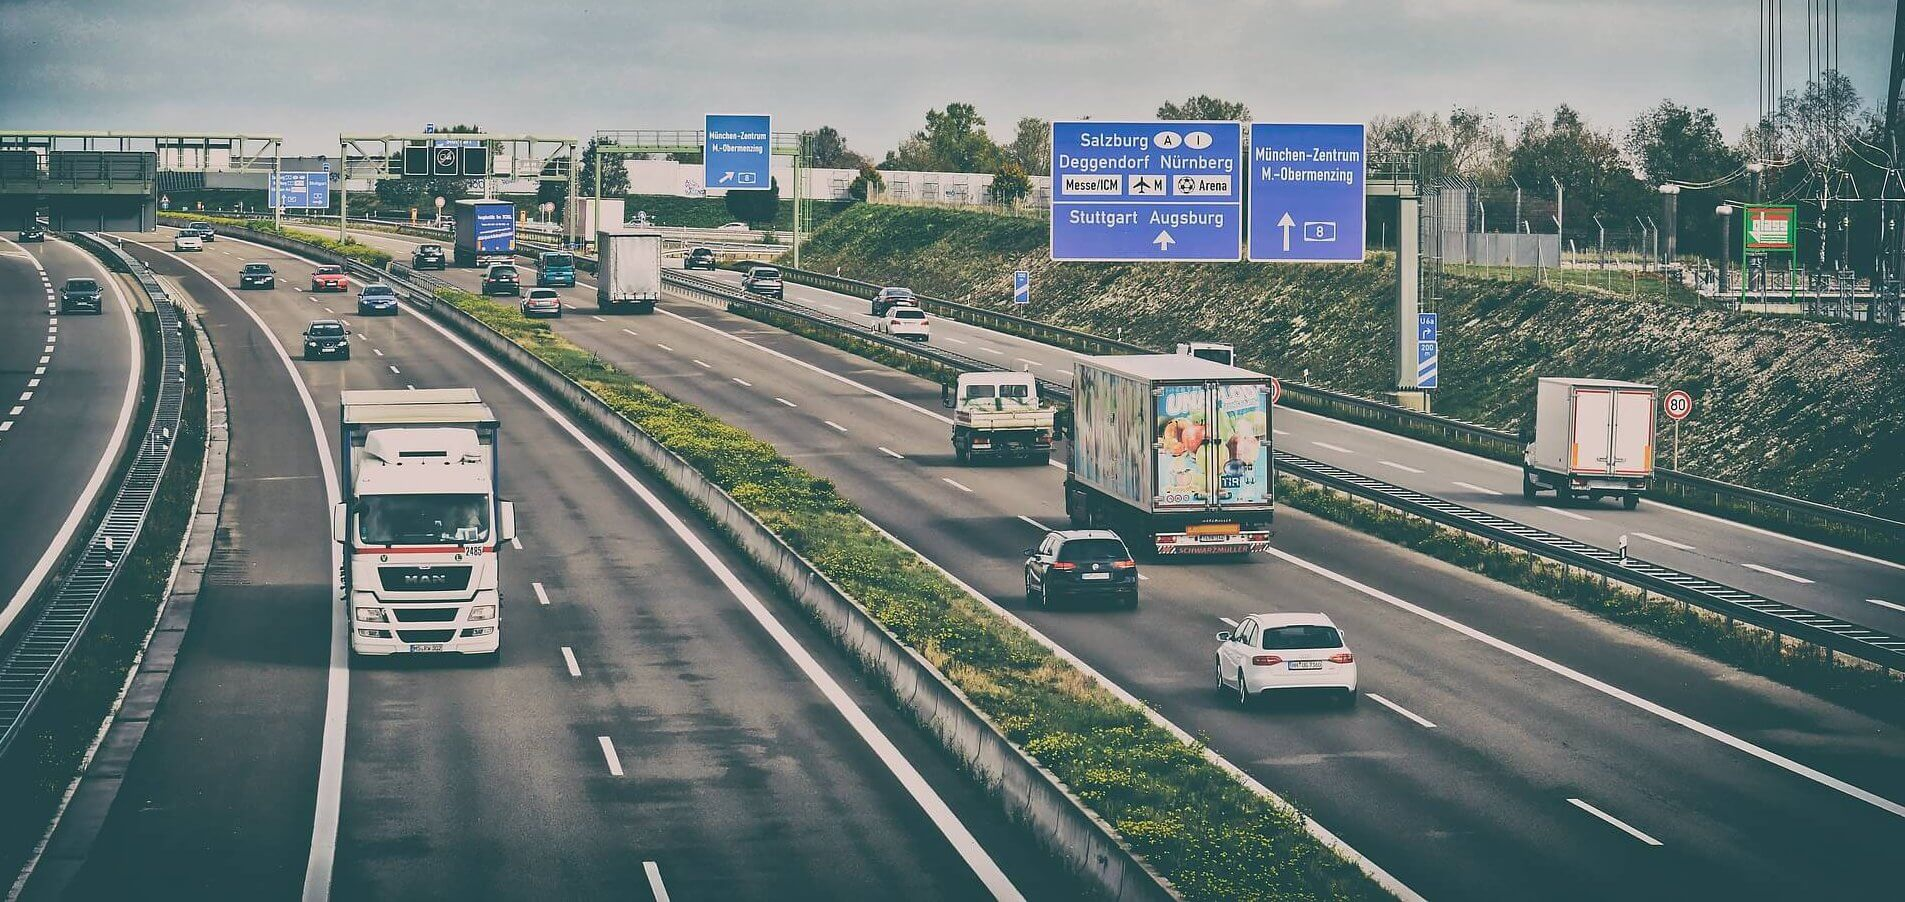 Truck bans in Germany in 2021